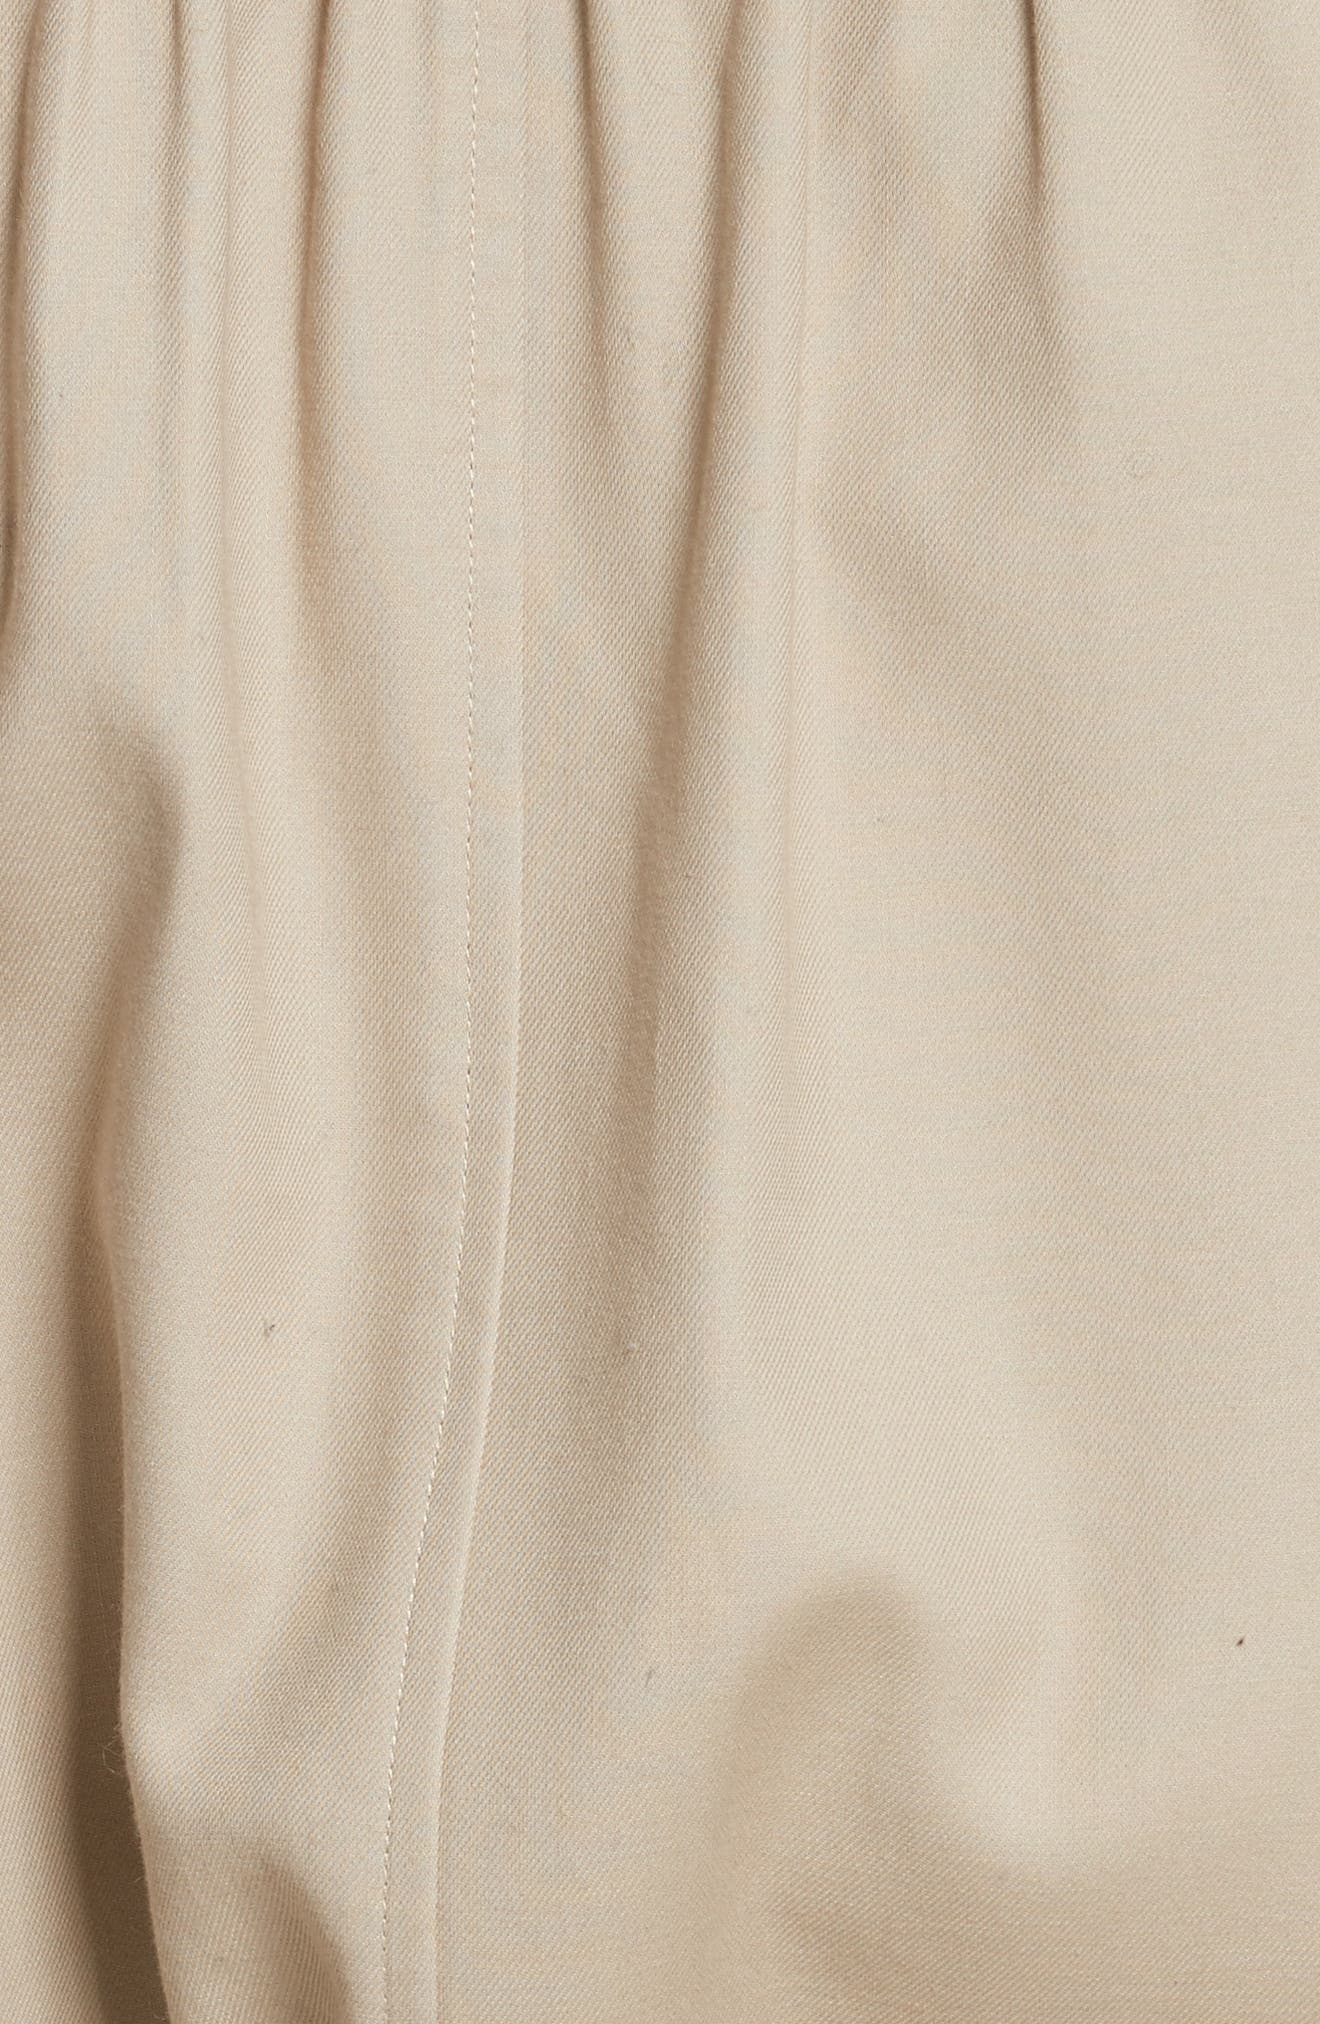 Alwena Cotton Trench Coat,                             Alternate thumbnail 5, color,                             Khaki